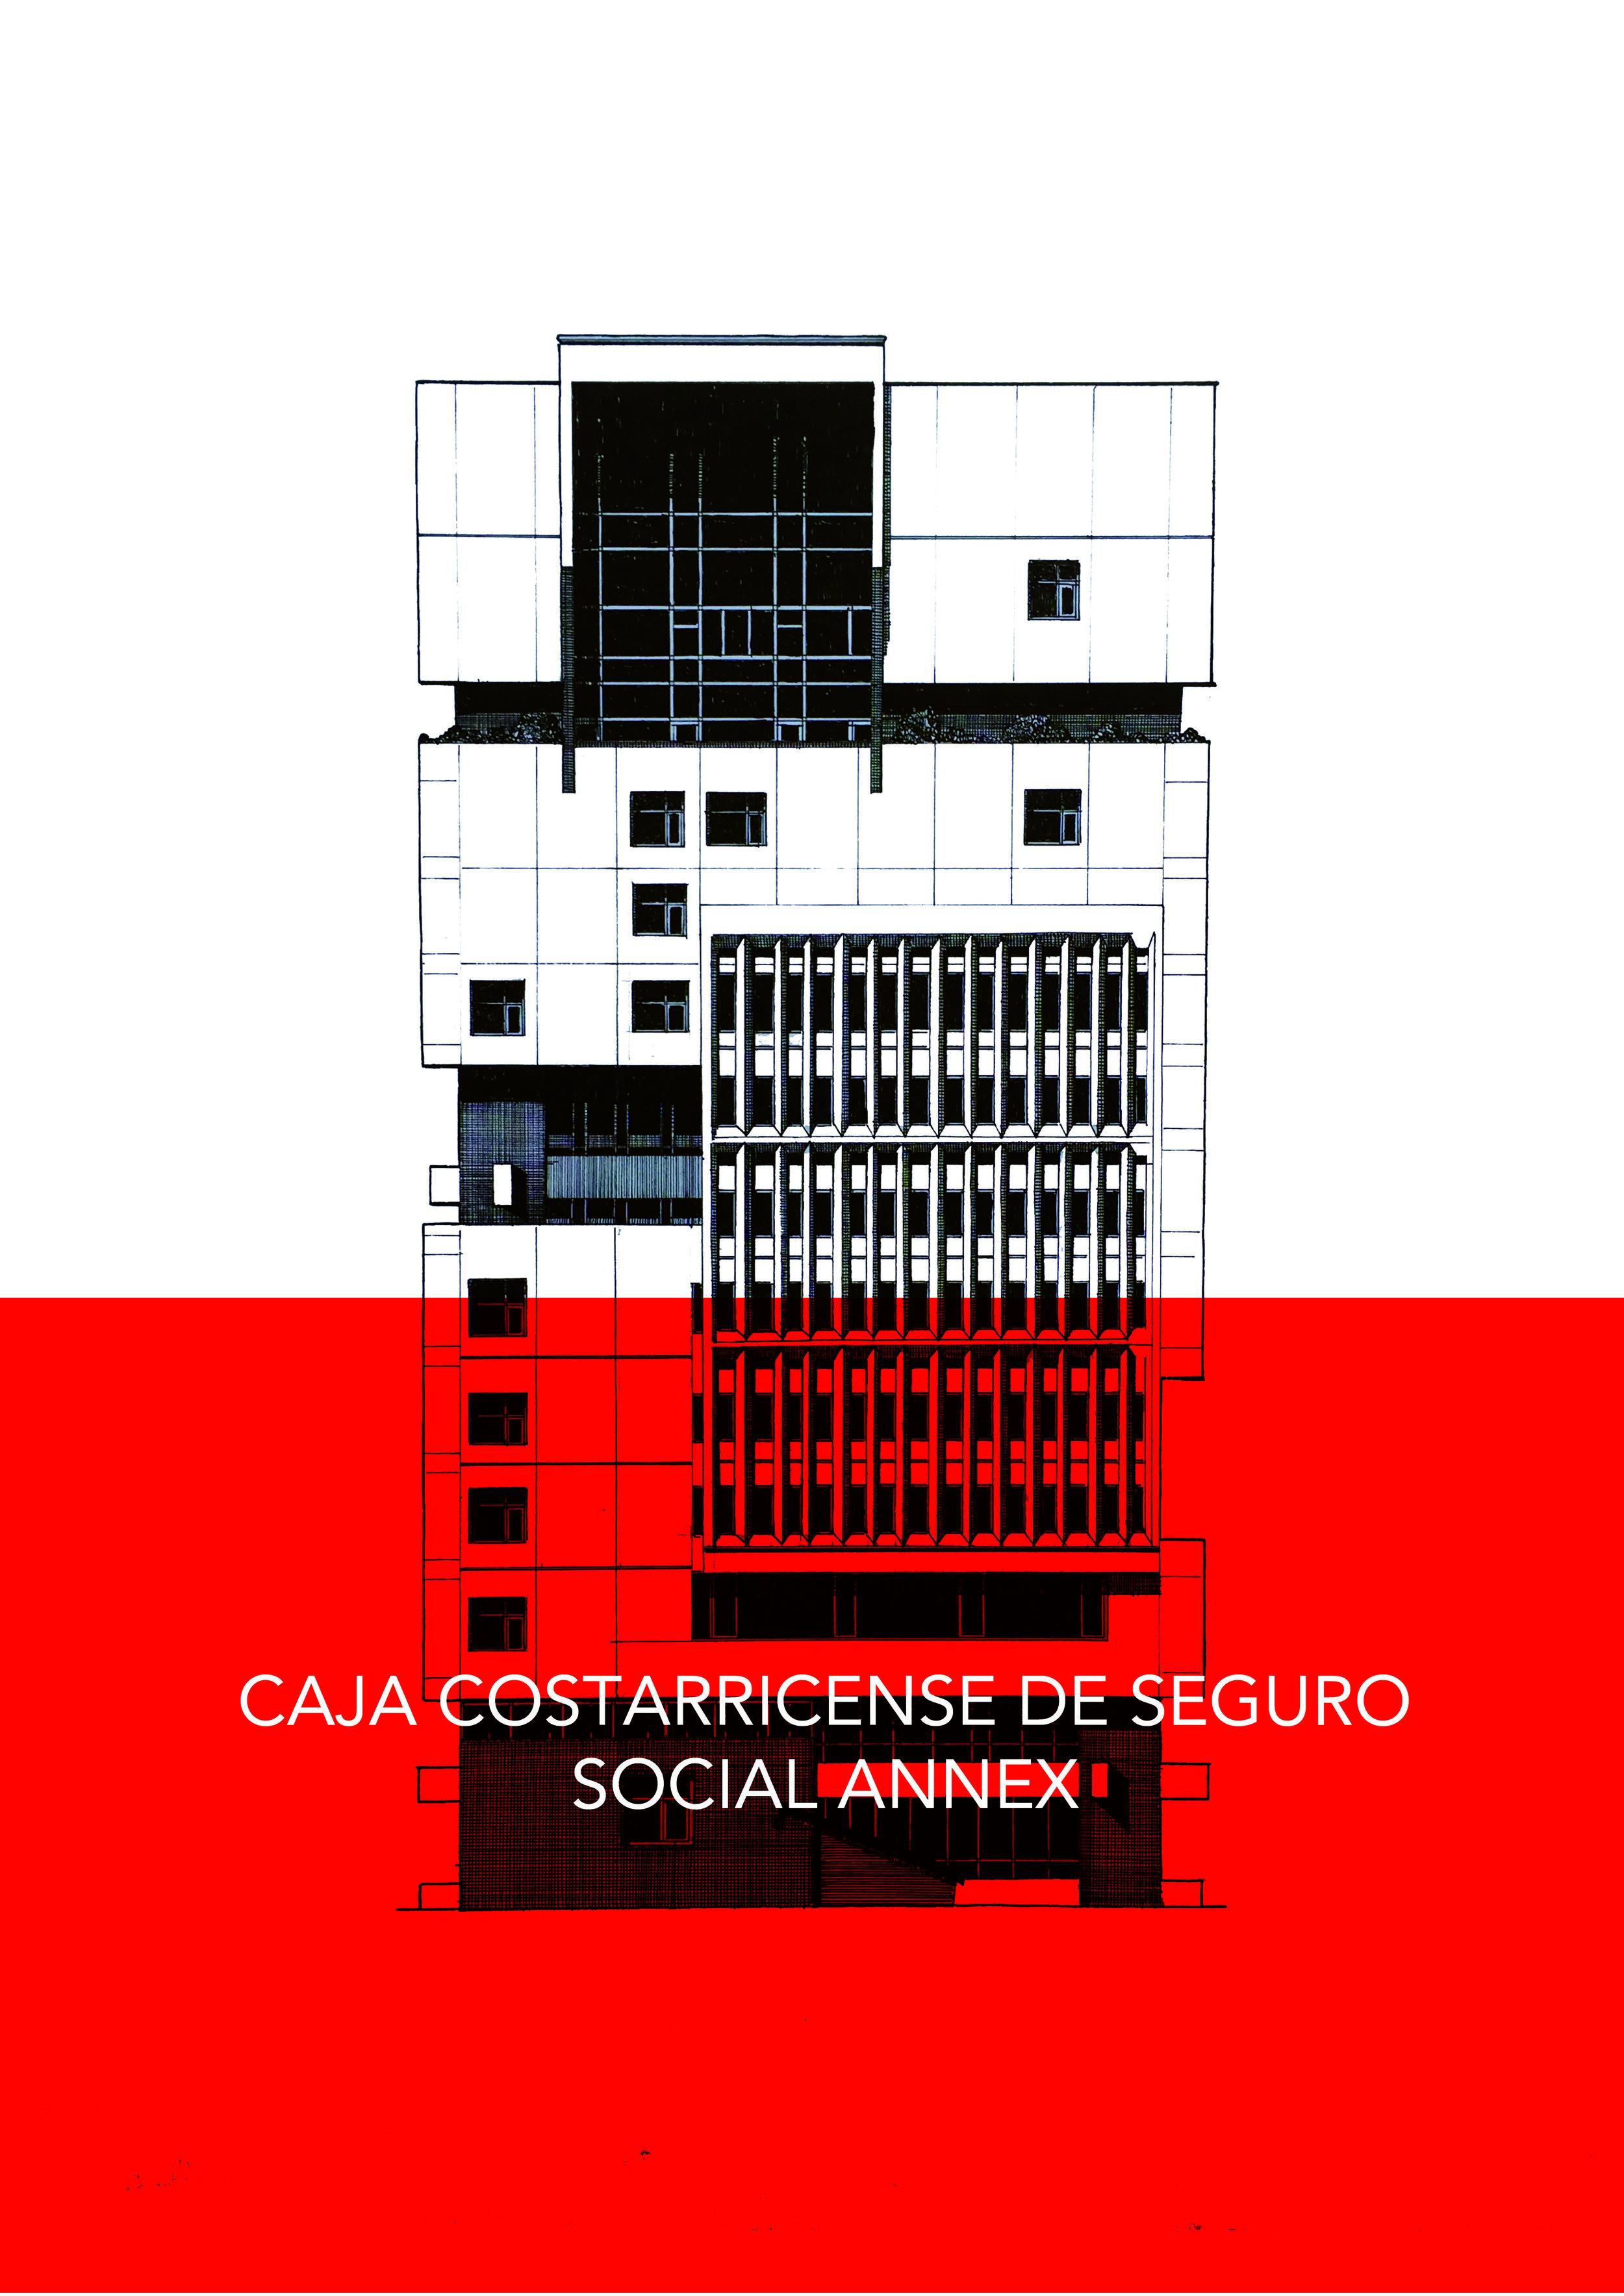 CCSS Building. Costa Rica